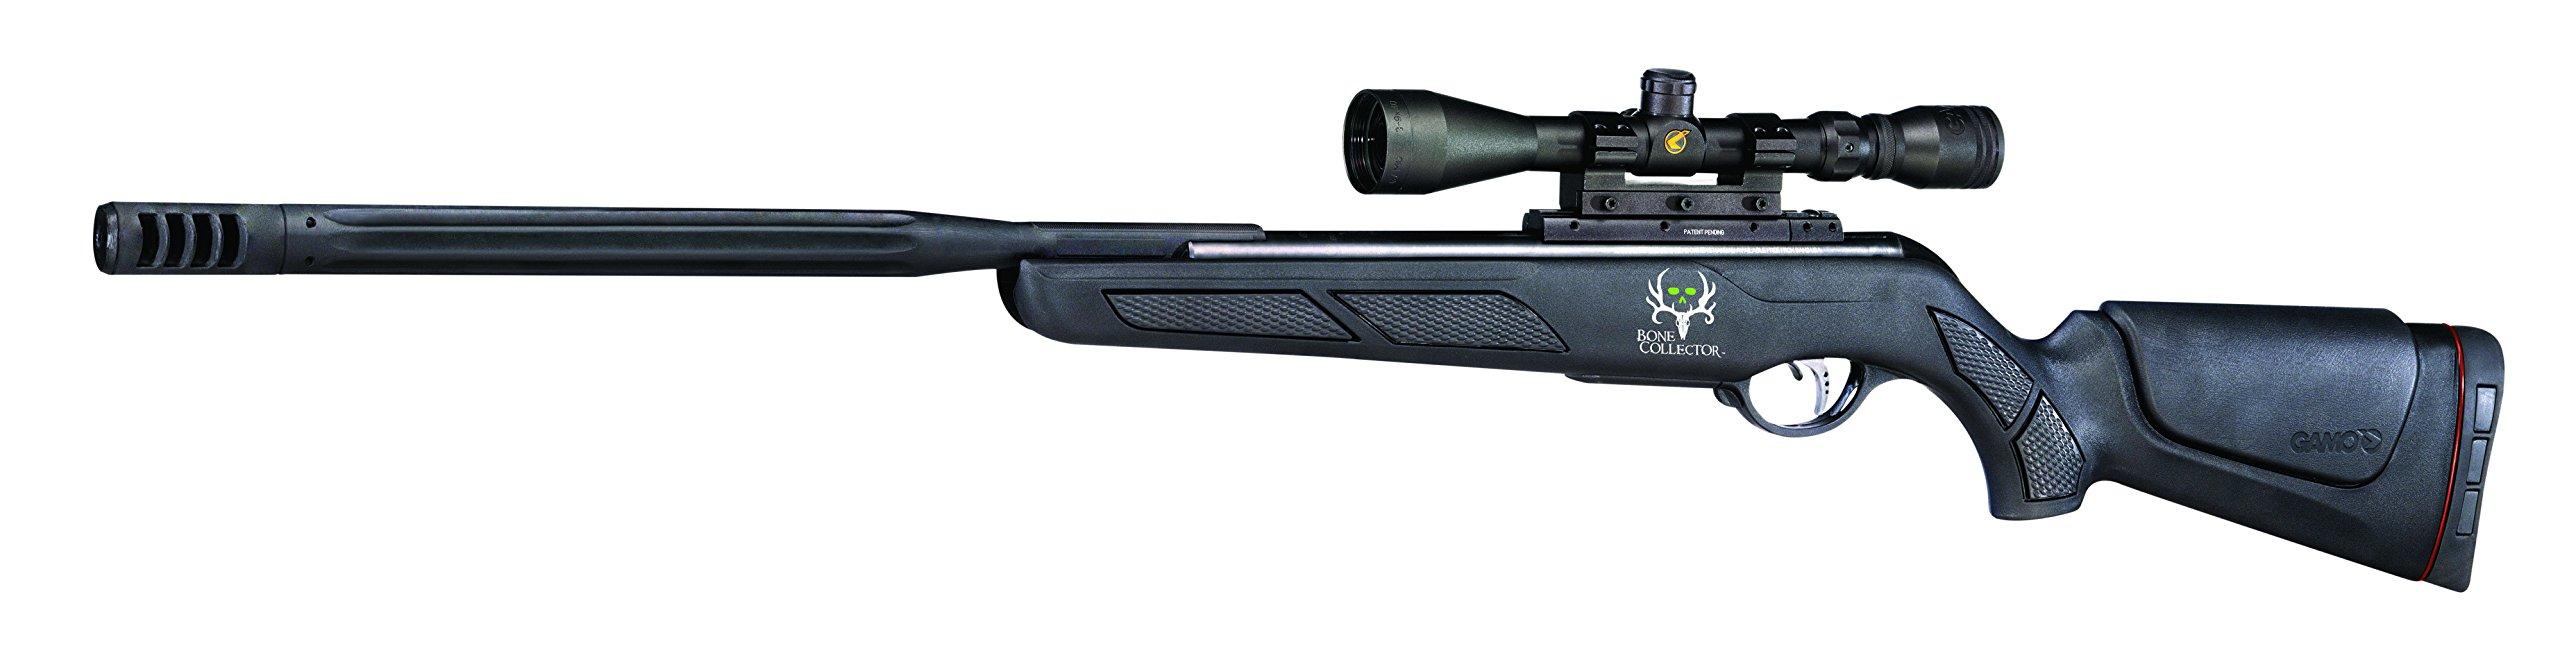 Gamo Bone Collector Maxxim IGT Air Rifle, .177 Caliber by Gamo